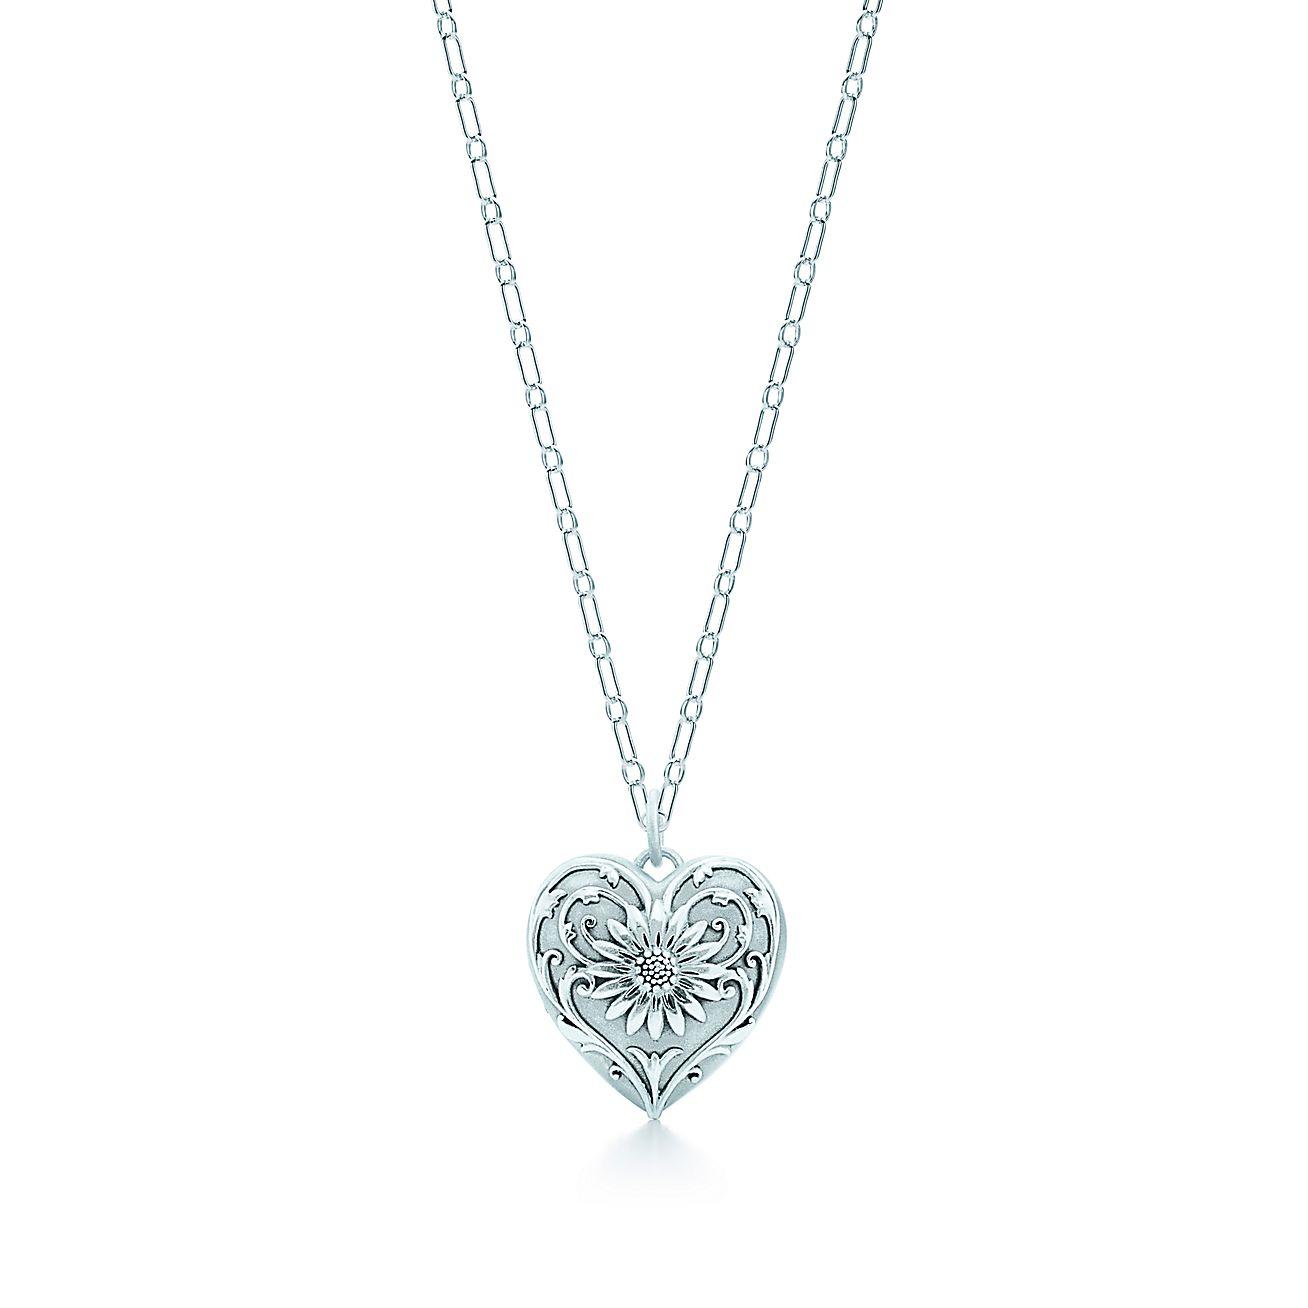 Ziegfeld Collection:Daisy Locket and Chain